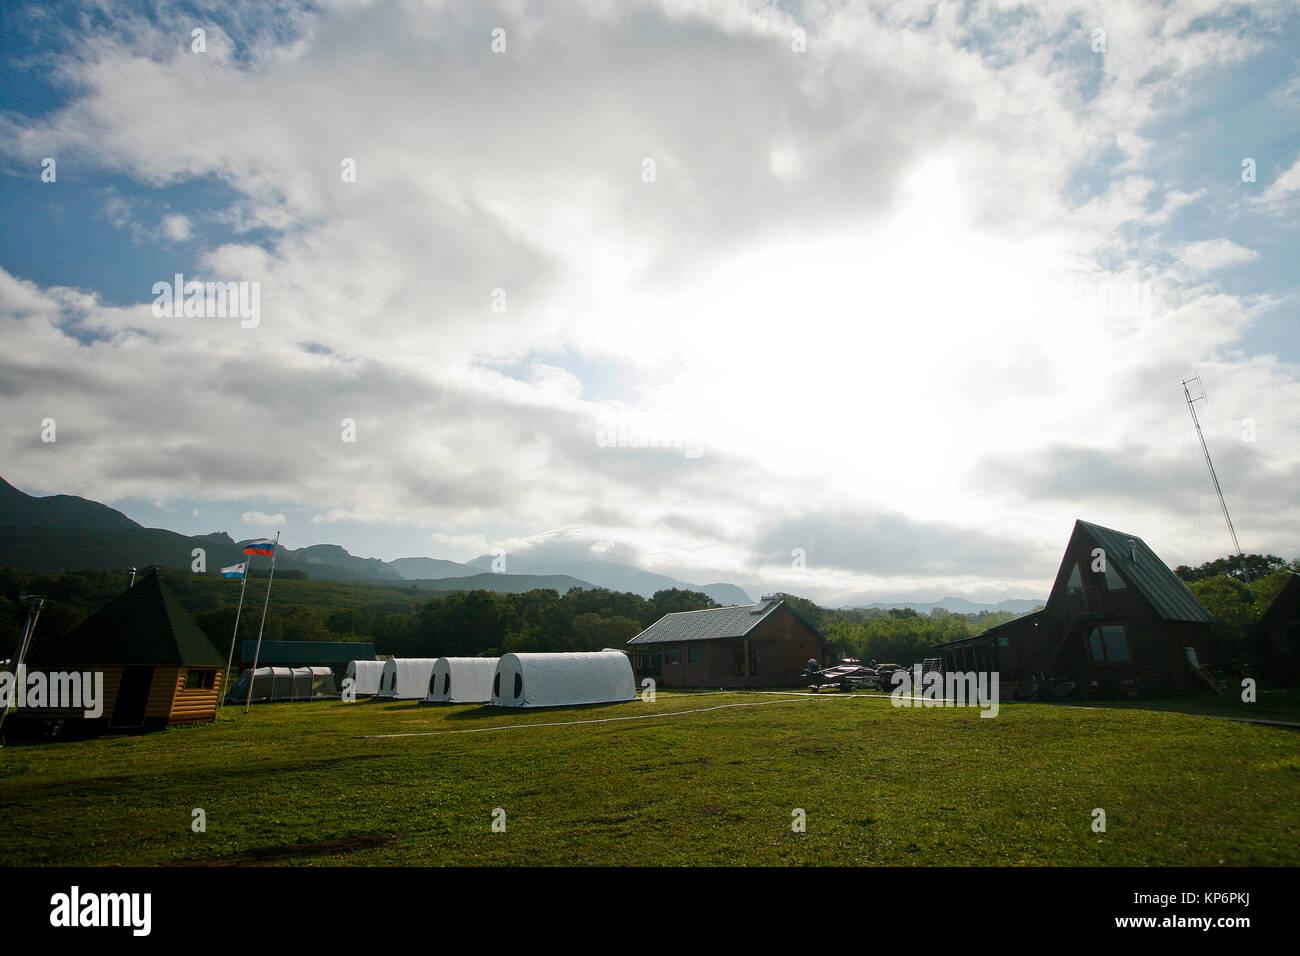 Campingplatz. Kurile See. Kamtschatka. Sibirien. Russland Stockbild